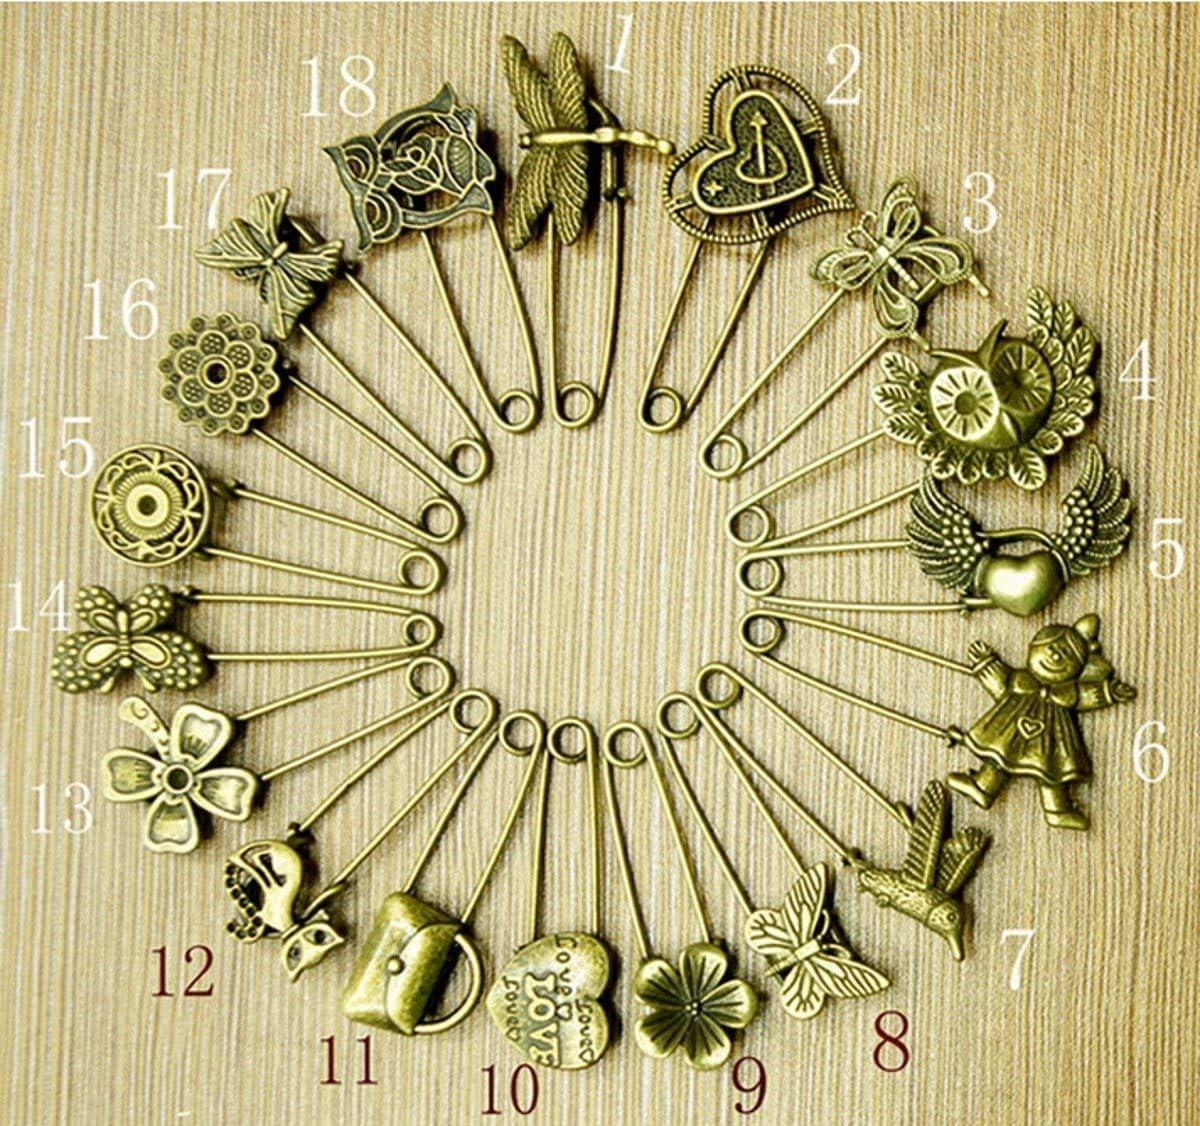 18pcs Set 4 years warranty Bronze Vintage Safety Pins Brooch Hijab Max 48% OFF